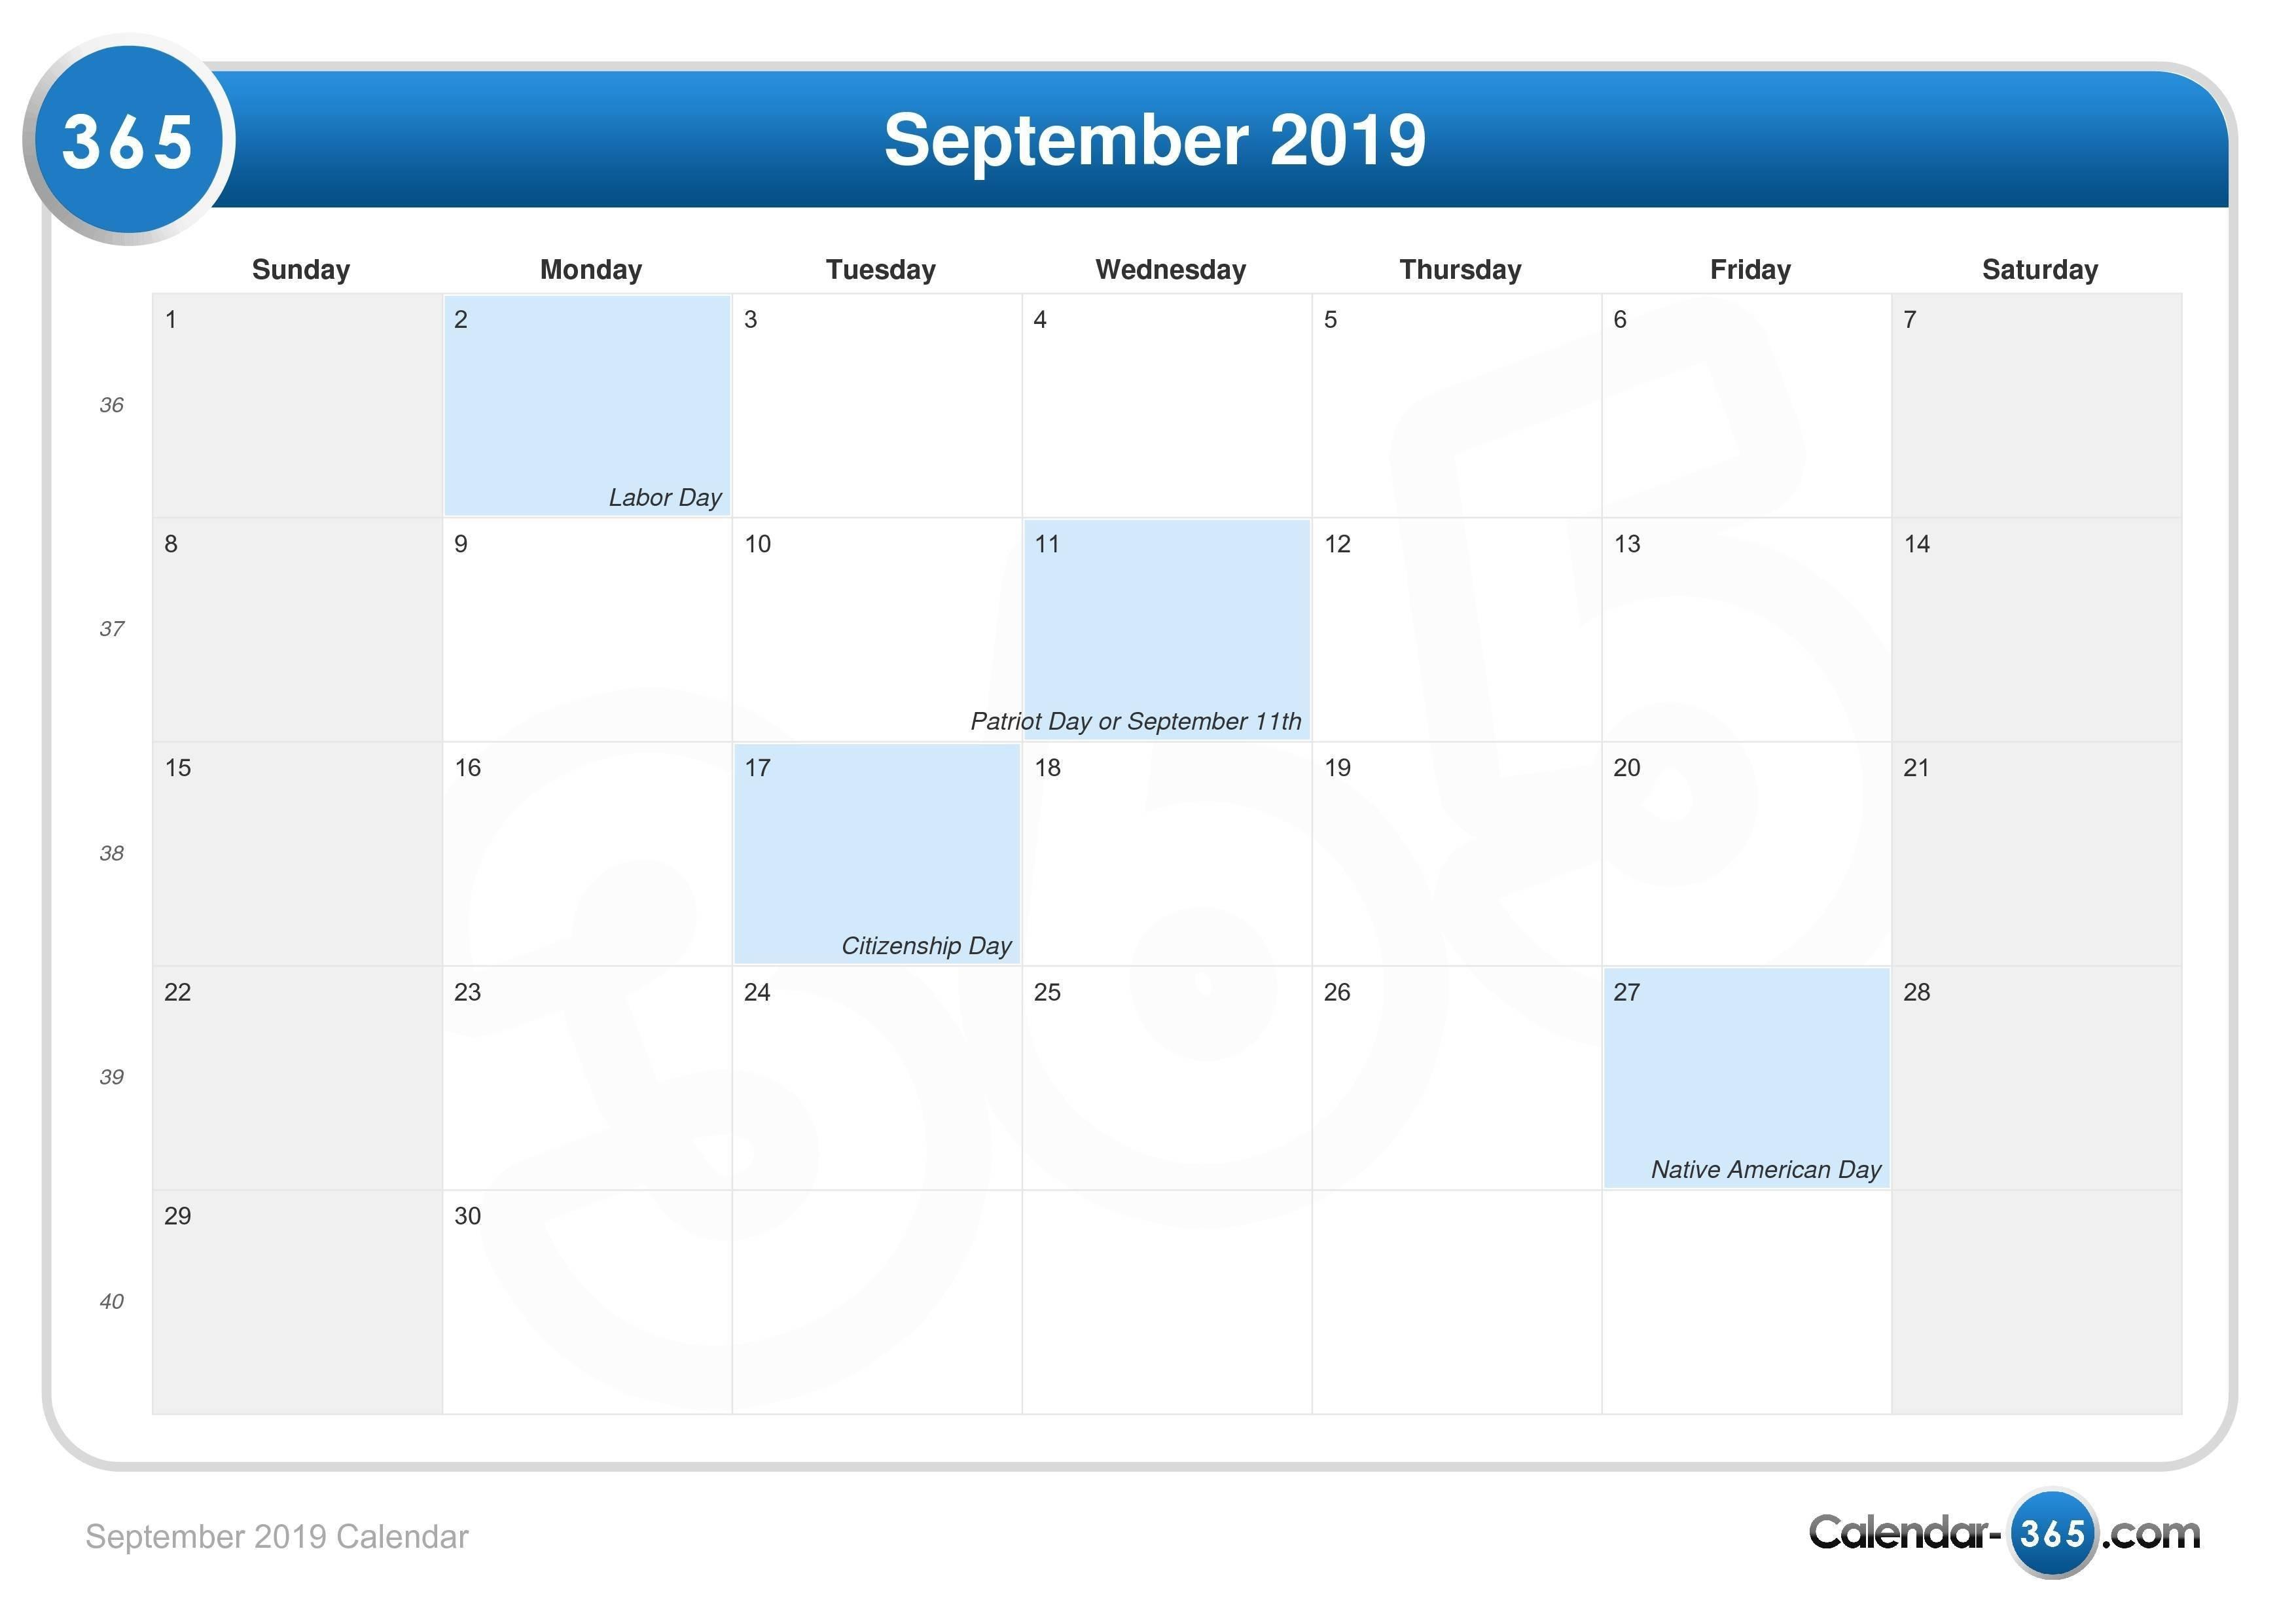 September 2019 Calendar September 7 2019 Calendar